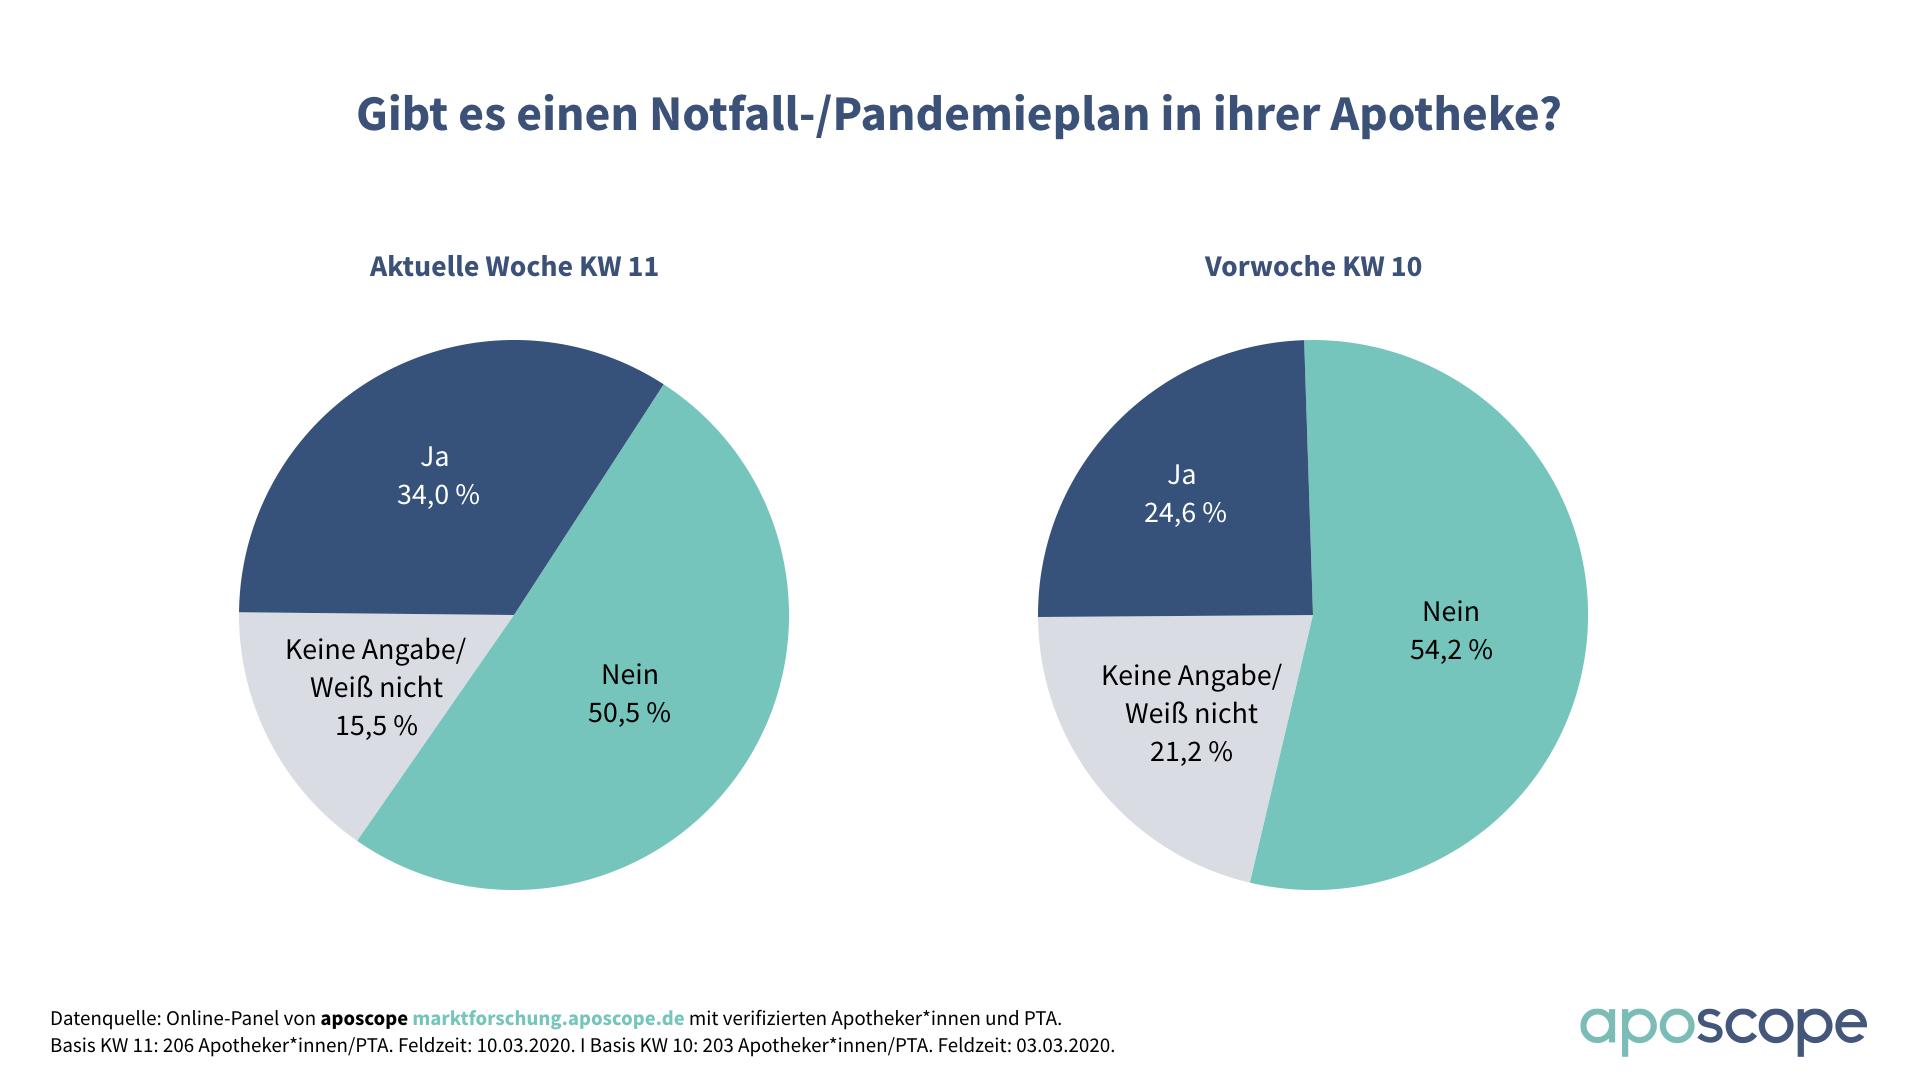 aposcope_Umfrage_Notfall_Pandemieplan_Apotheke